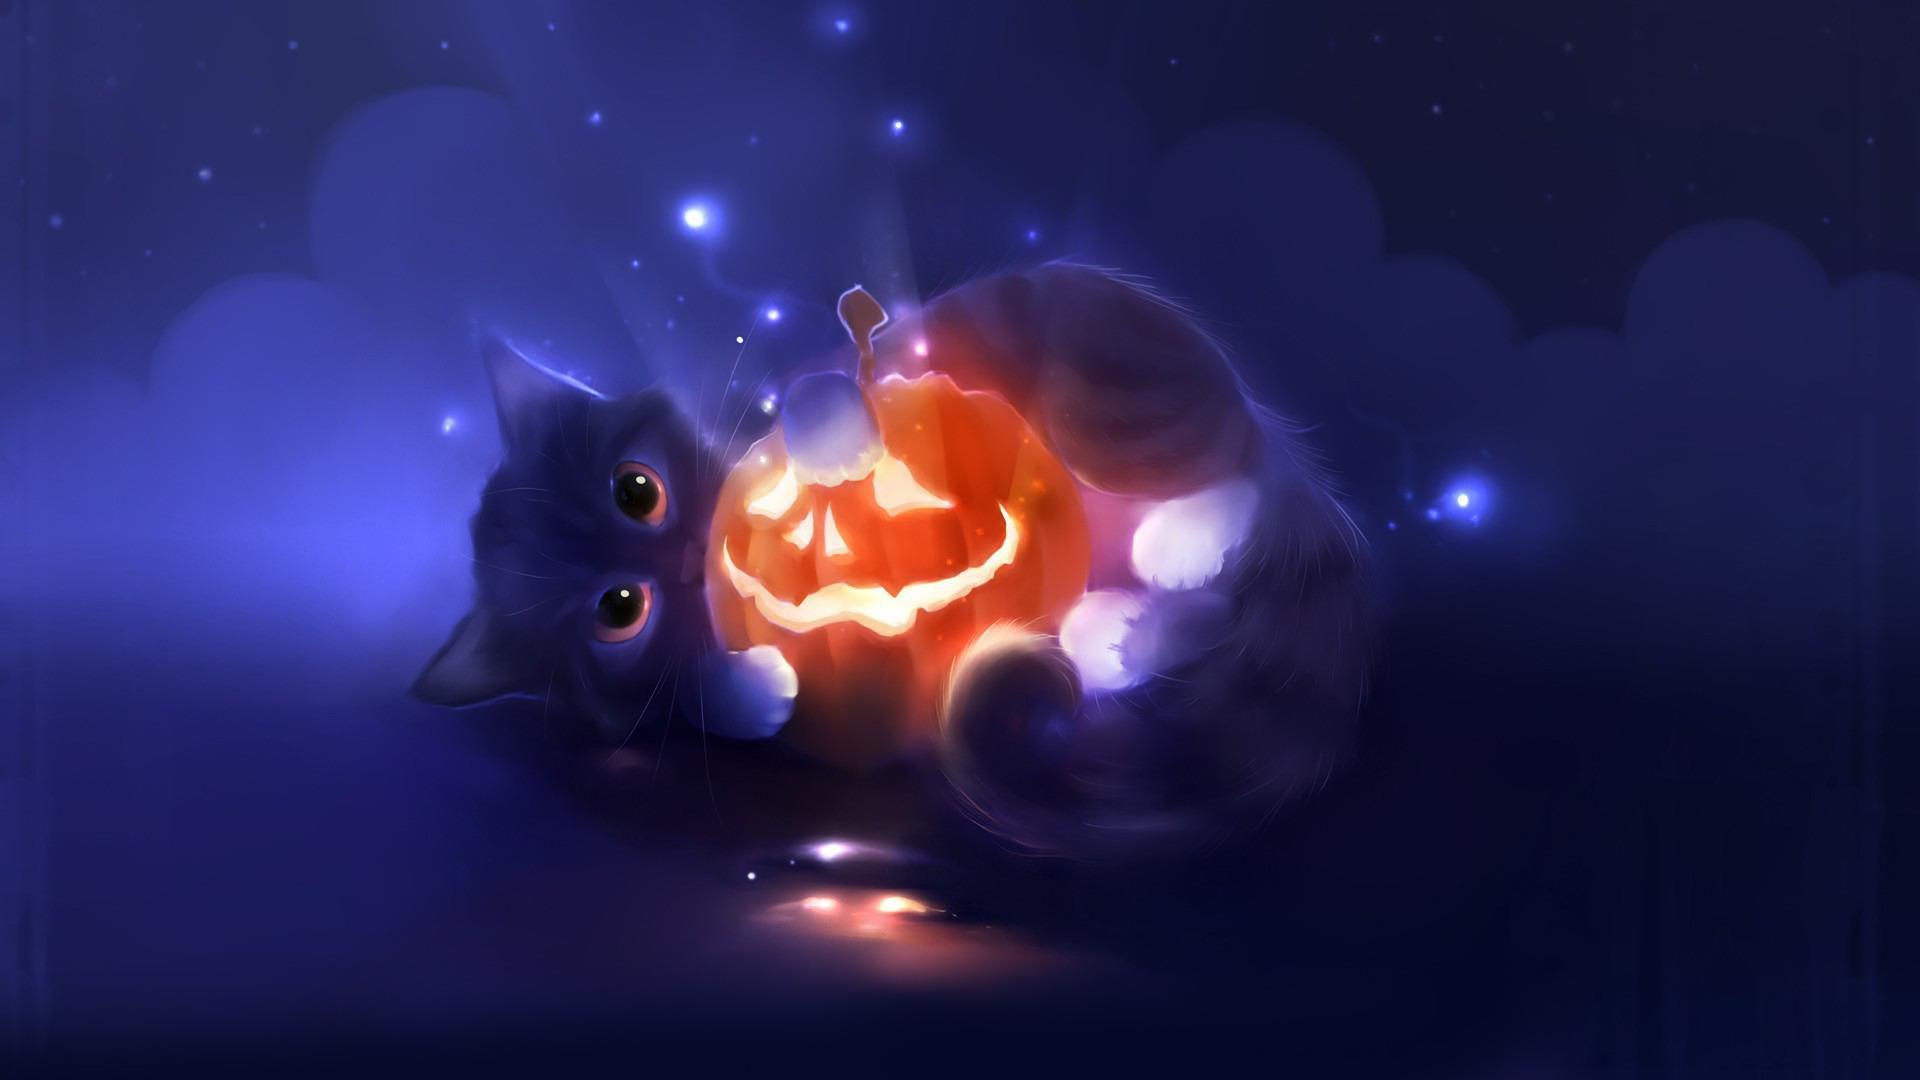 Download Halloween Cute Black Cat Wallpaper Full Size Mx